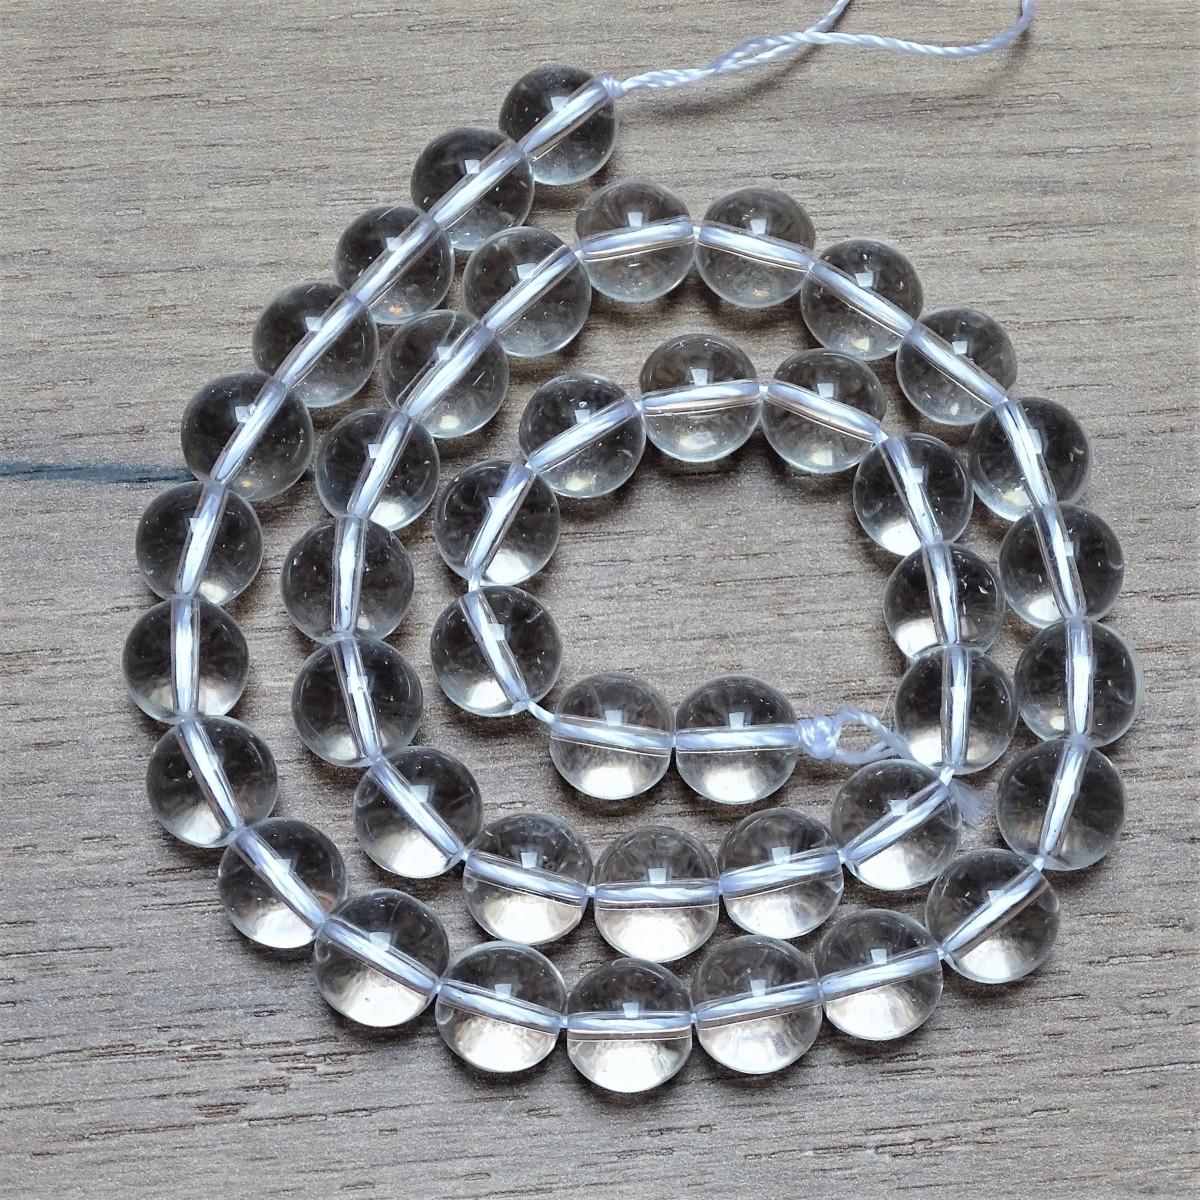 Natural quartz crystal beads - Ø 7,5 mm